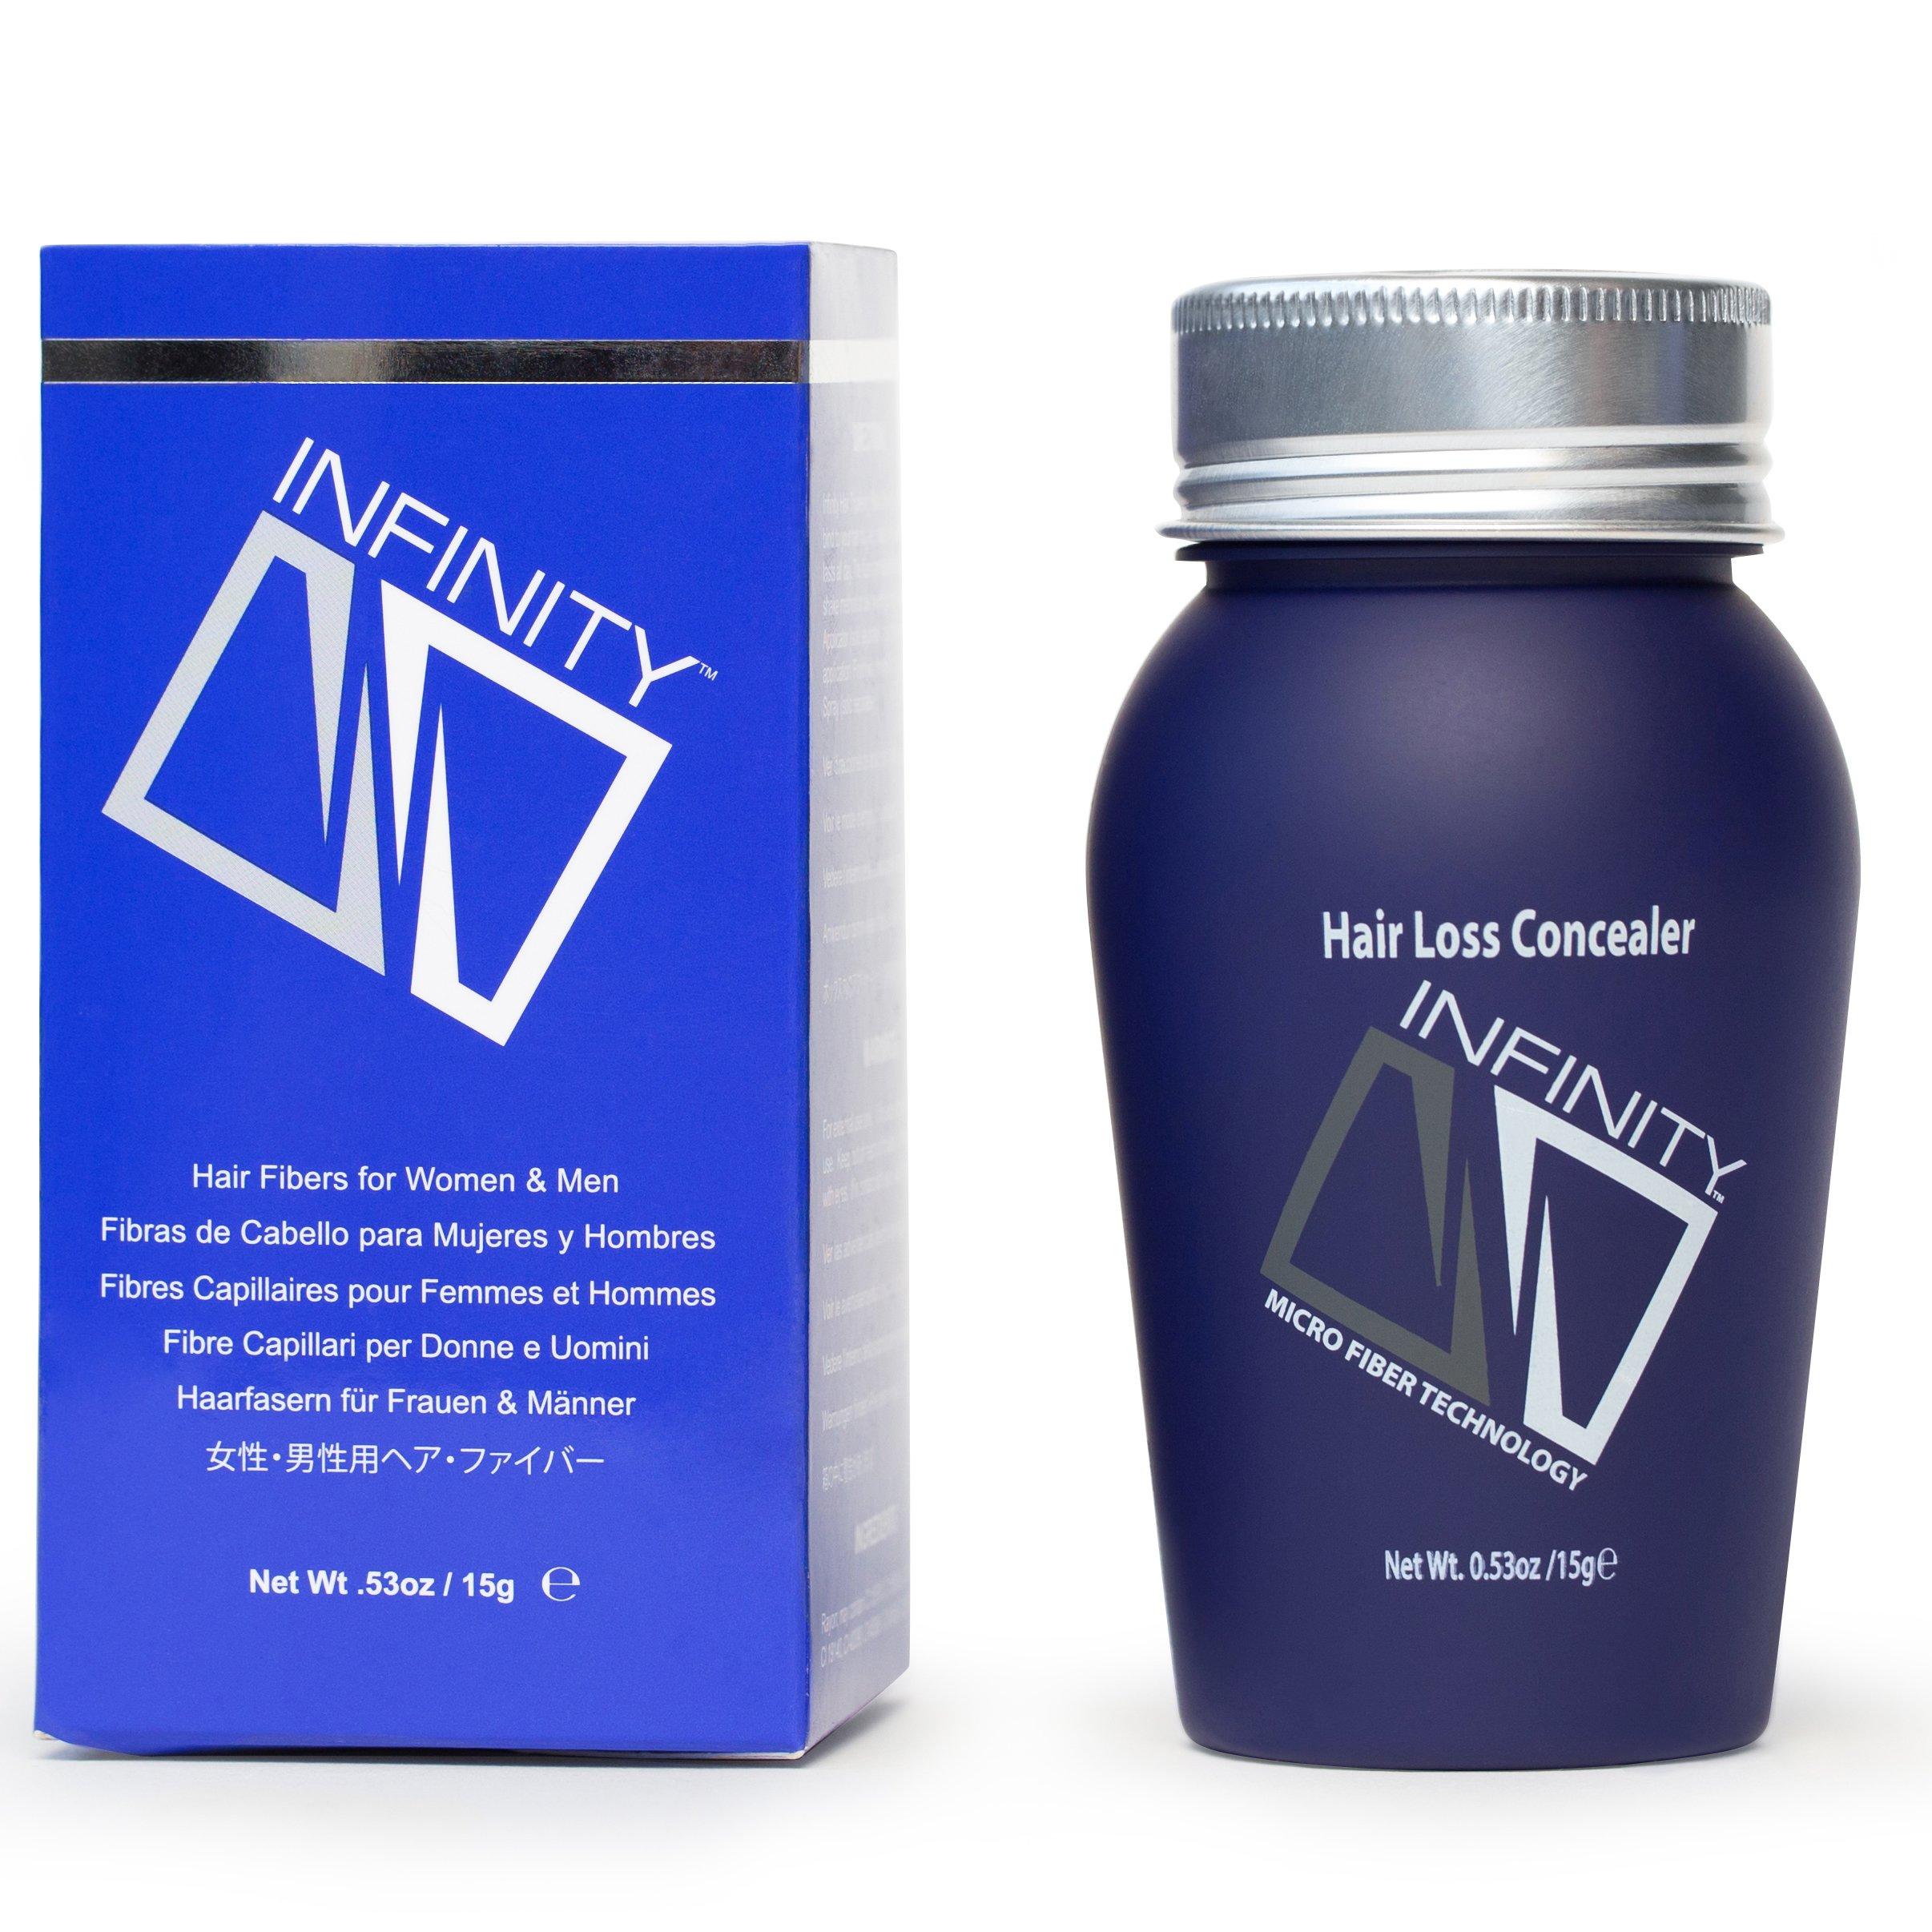 Infinity Hair Fiber - Hair Loss Concealer - Hair Thickening Fiber for Men & Women - Dark Brown, 15g by Infinity